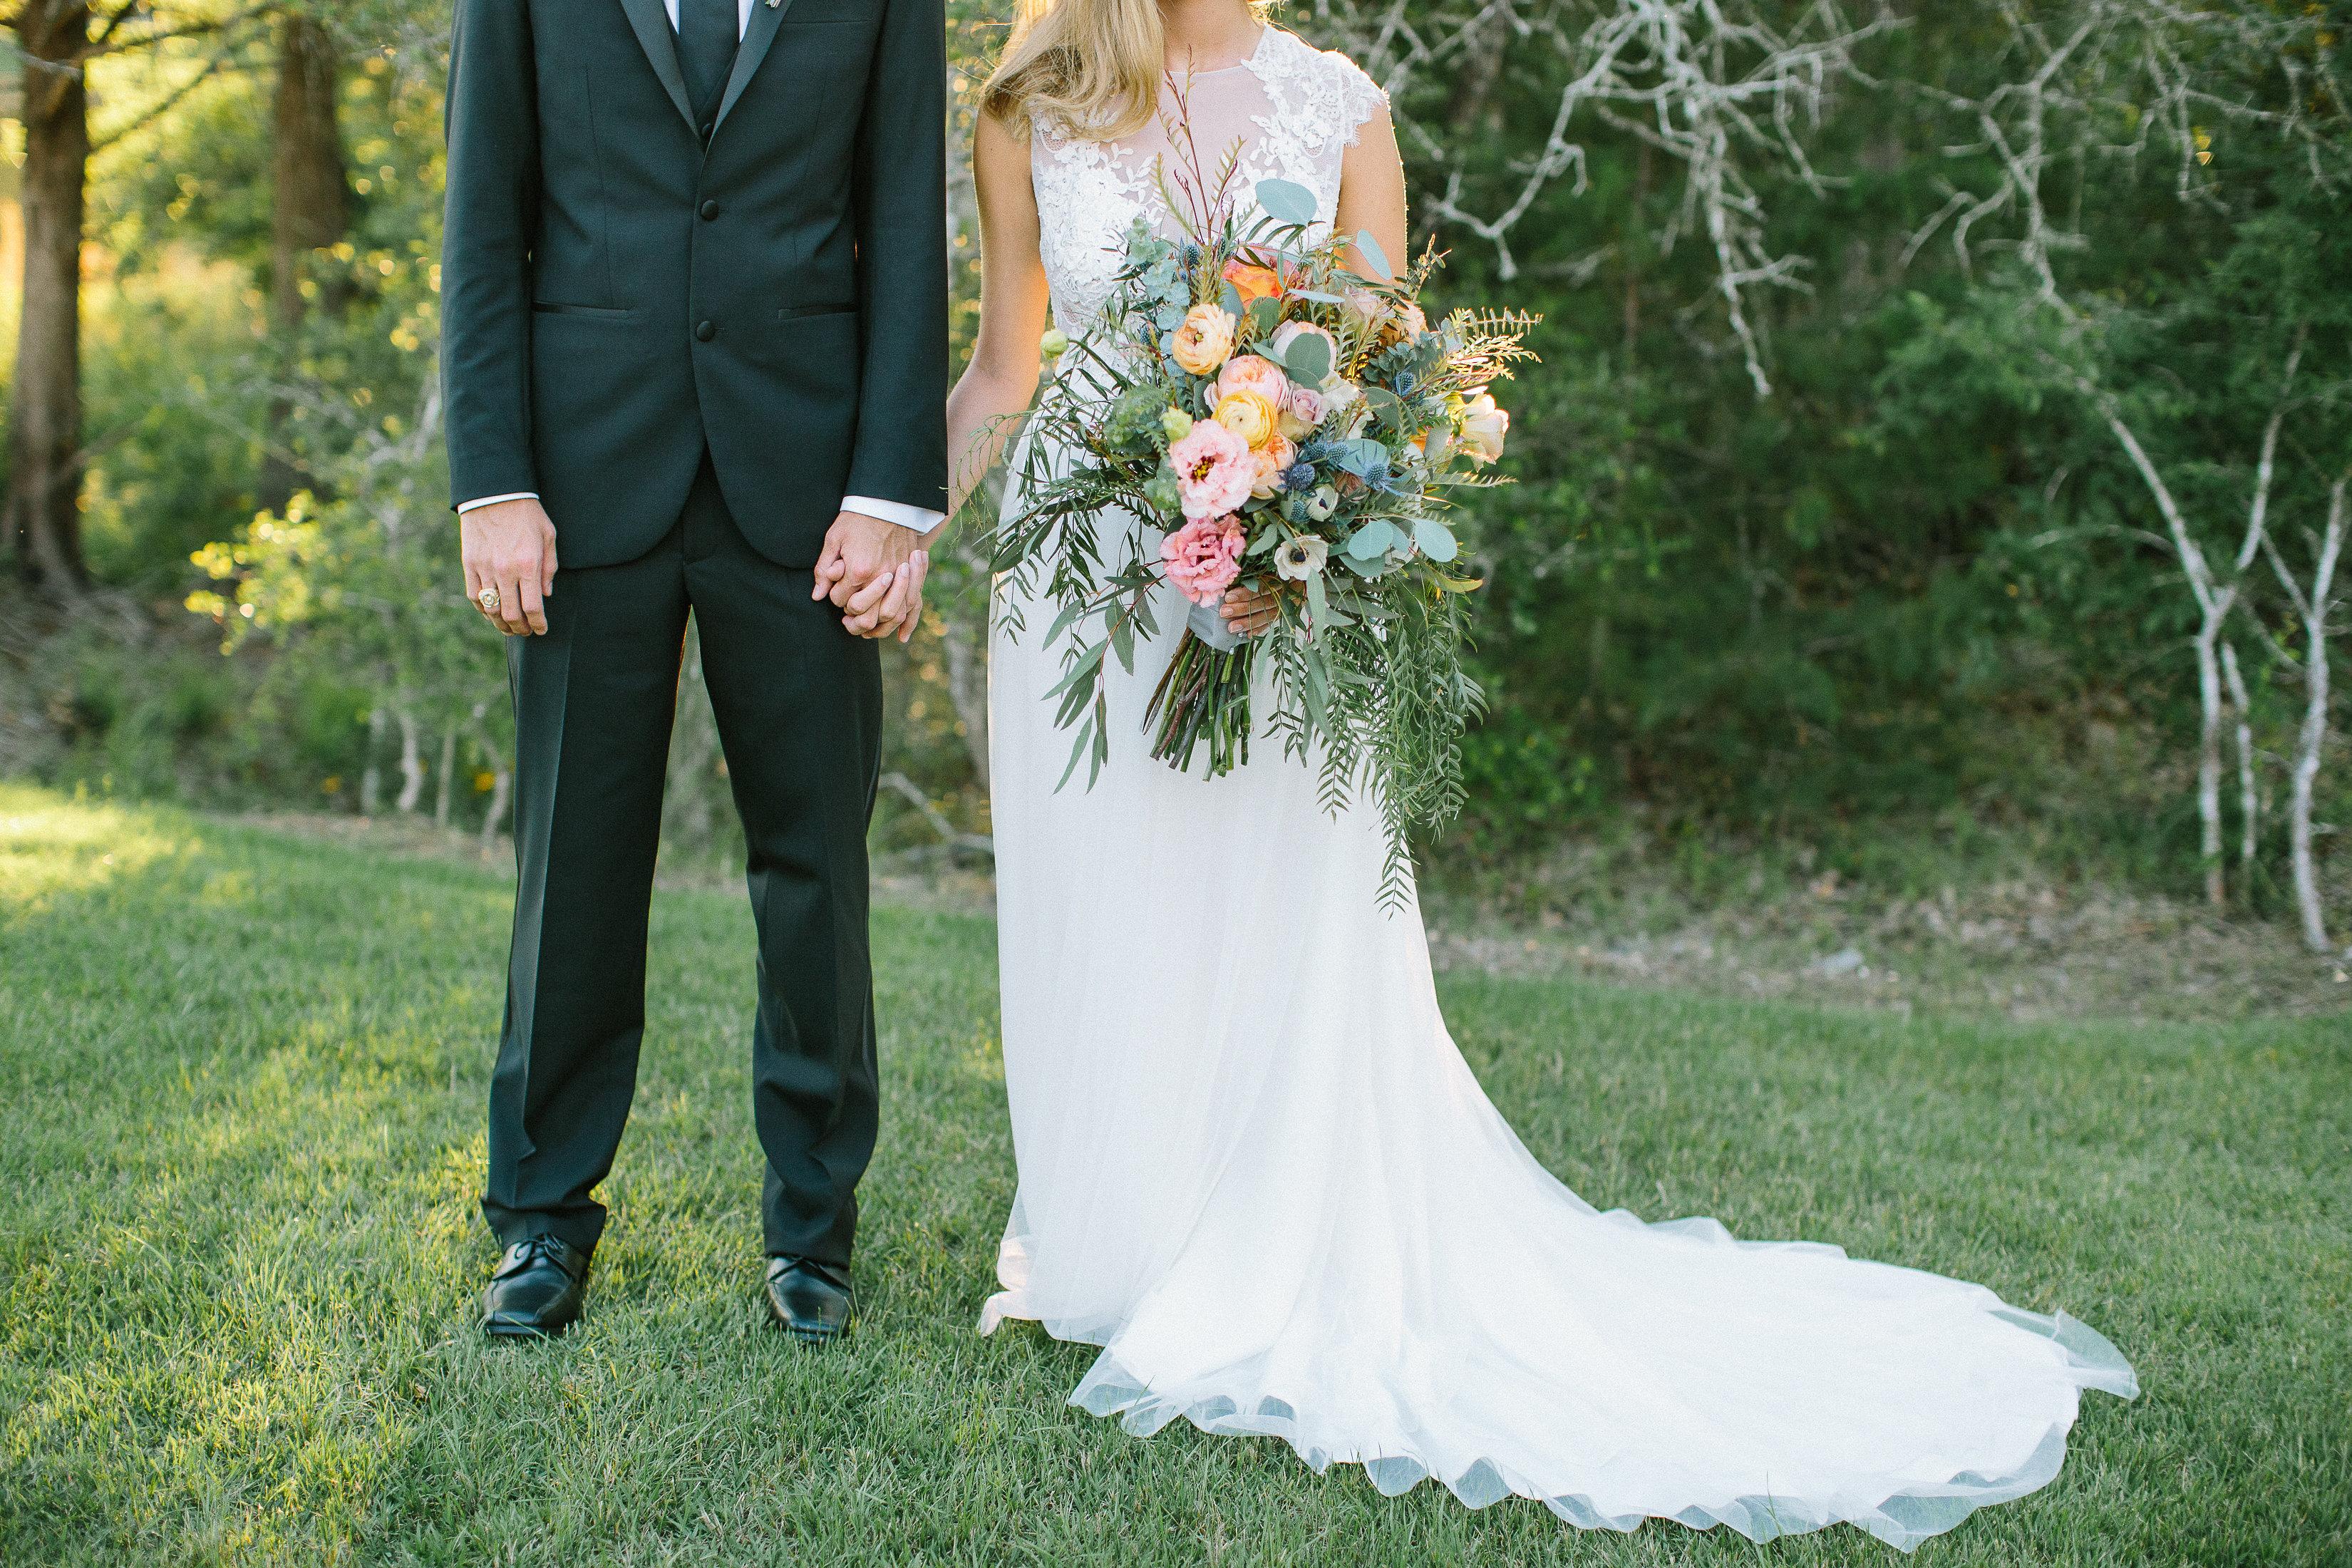 Ellen-Ashton-Photography-Peach-Creek-Ranch-Weddings-Wed-and-Prosper282